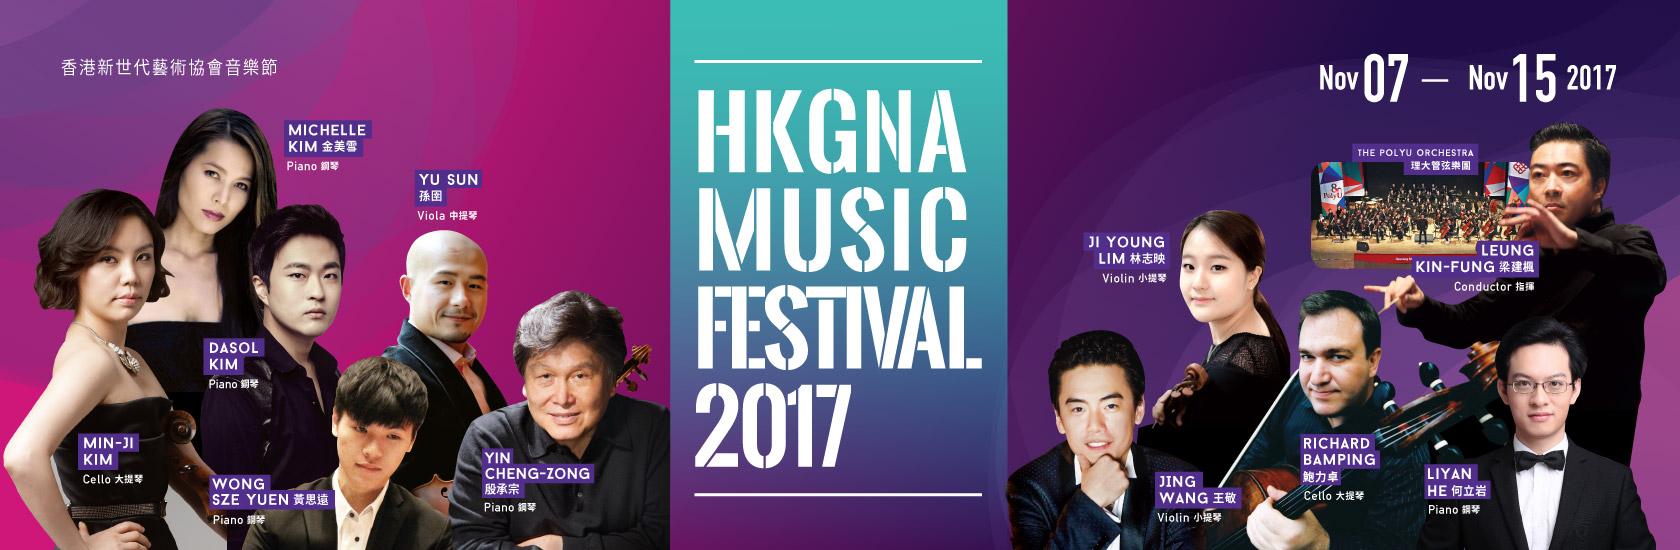 web-banner2017